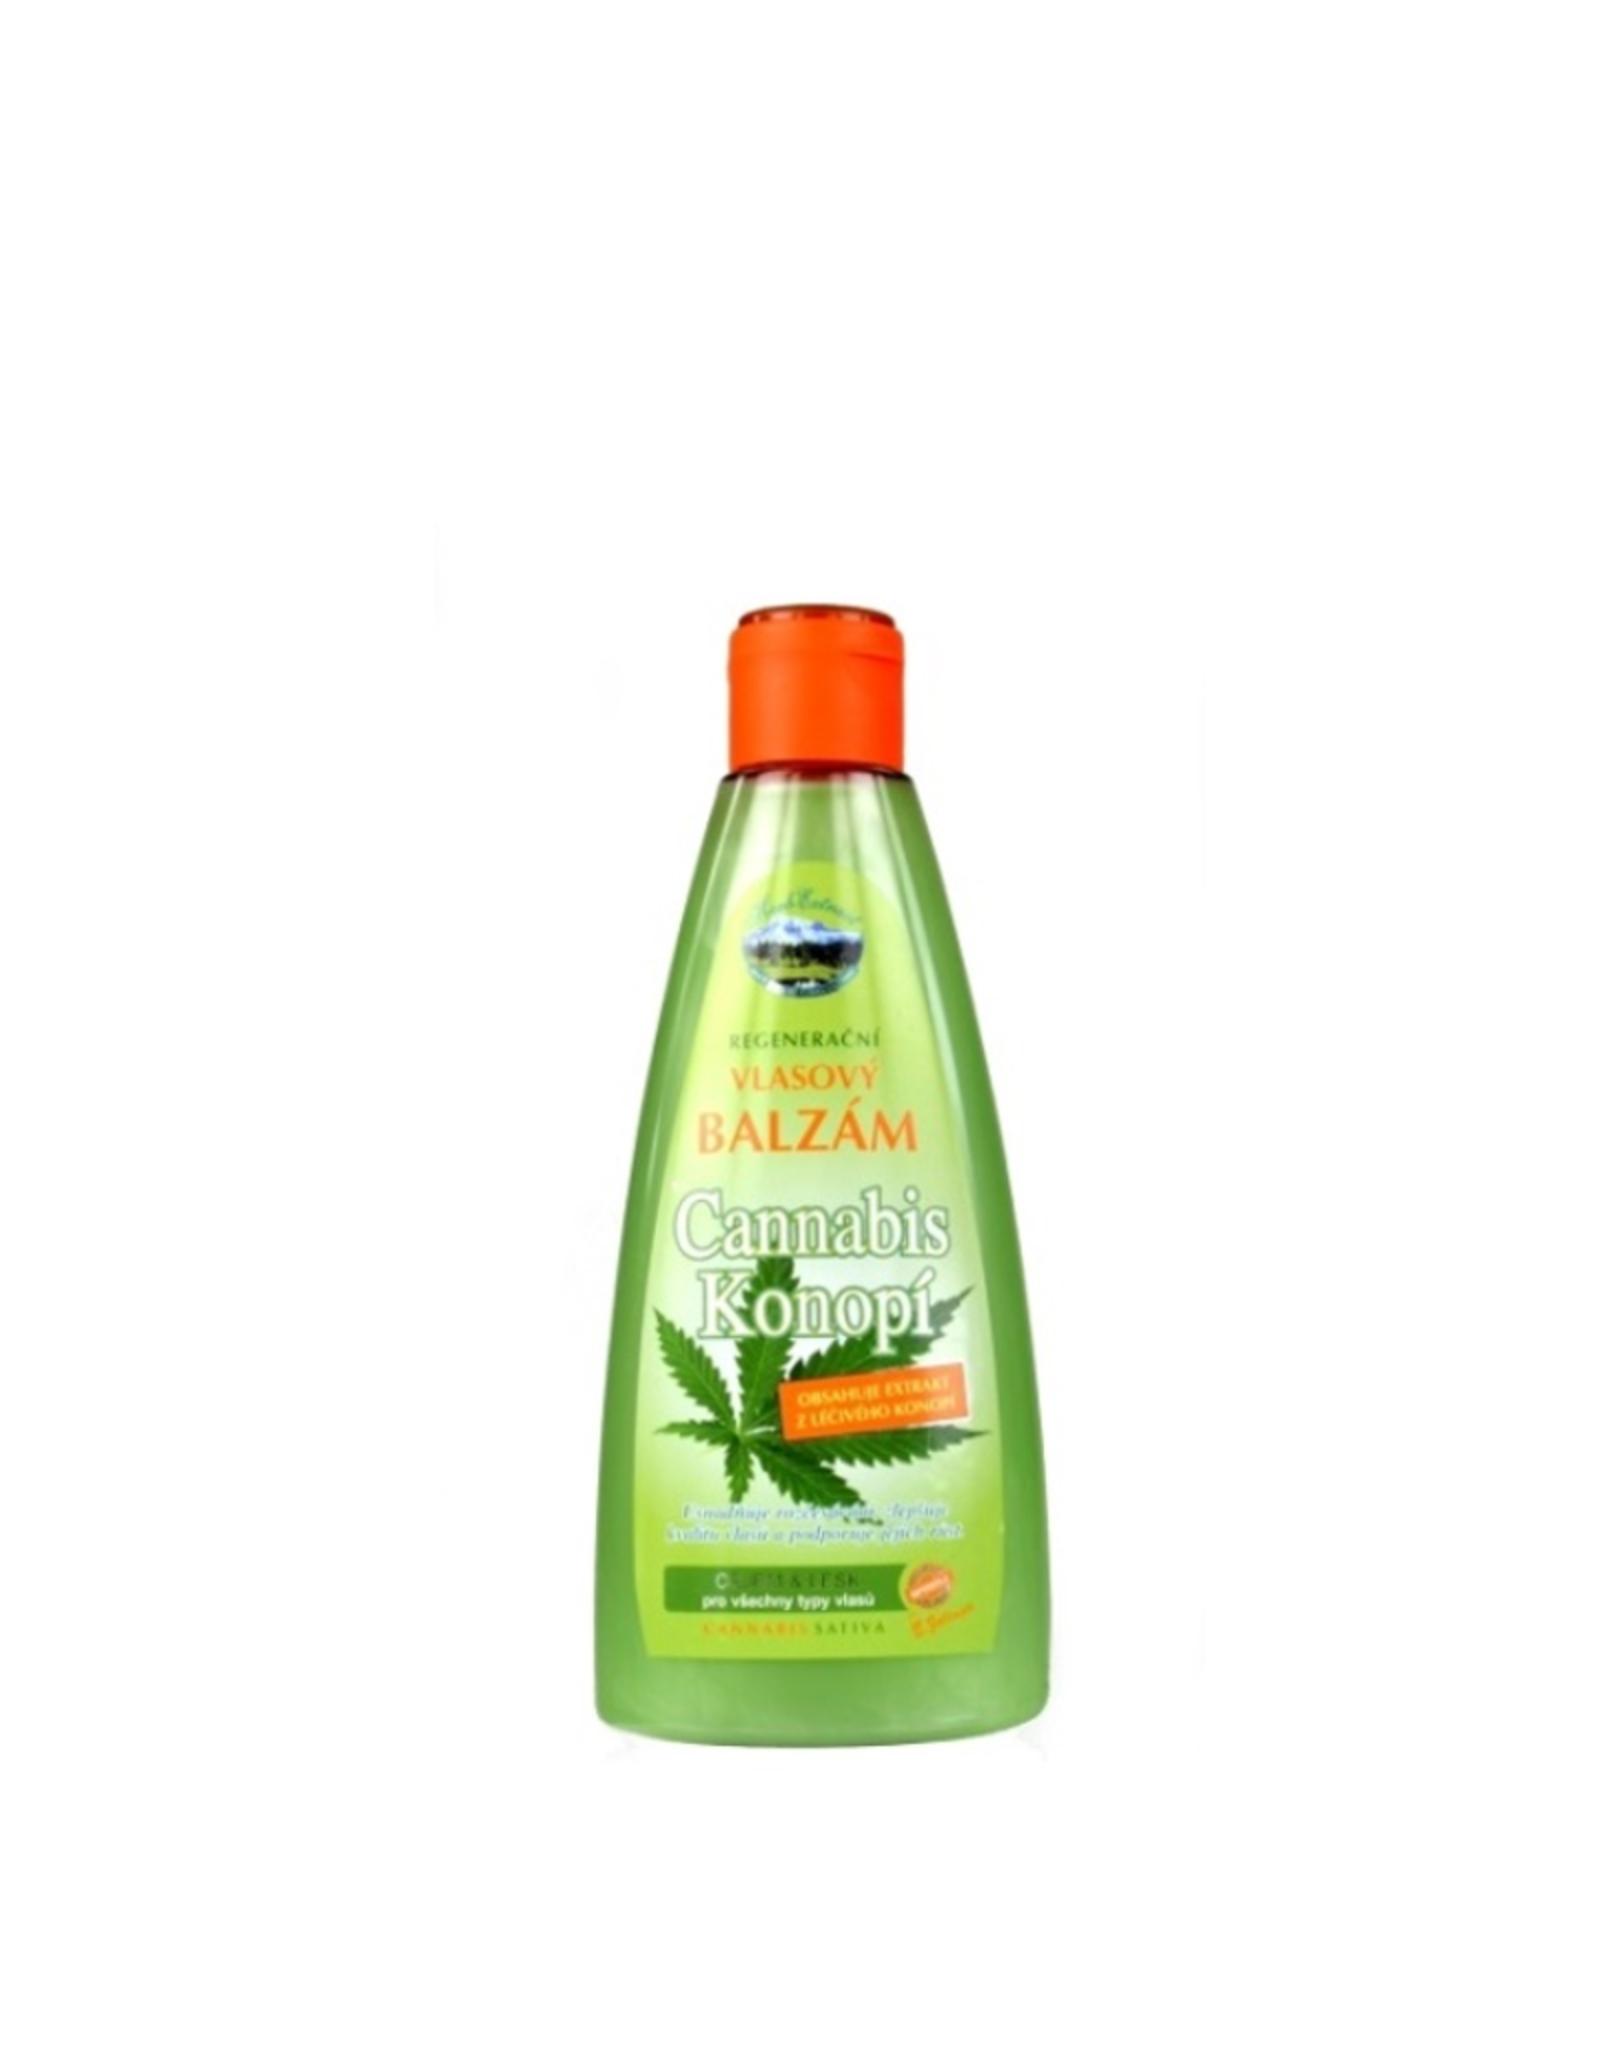 Herb Extract® Shampoo met Cannabis olie